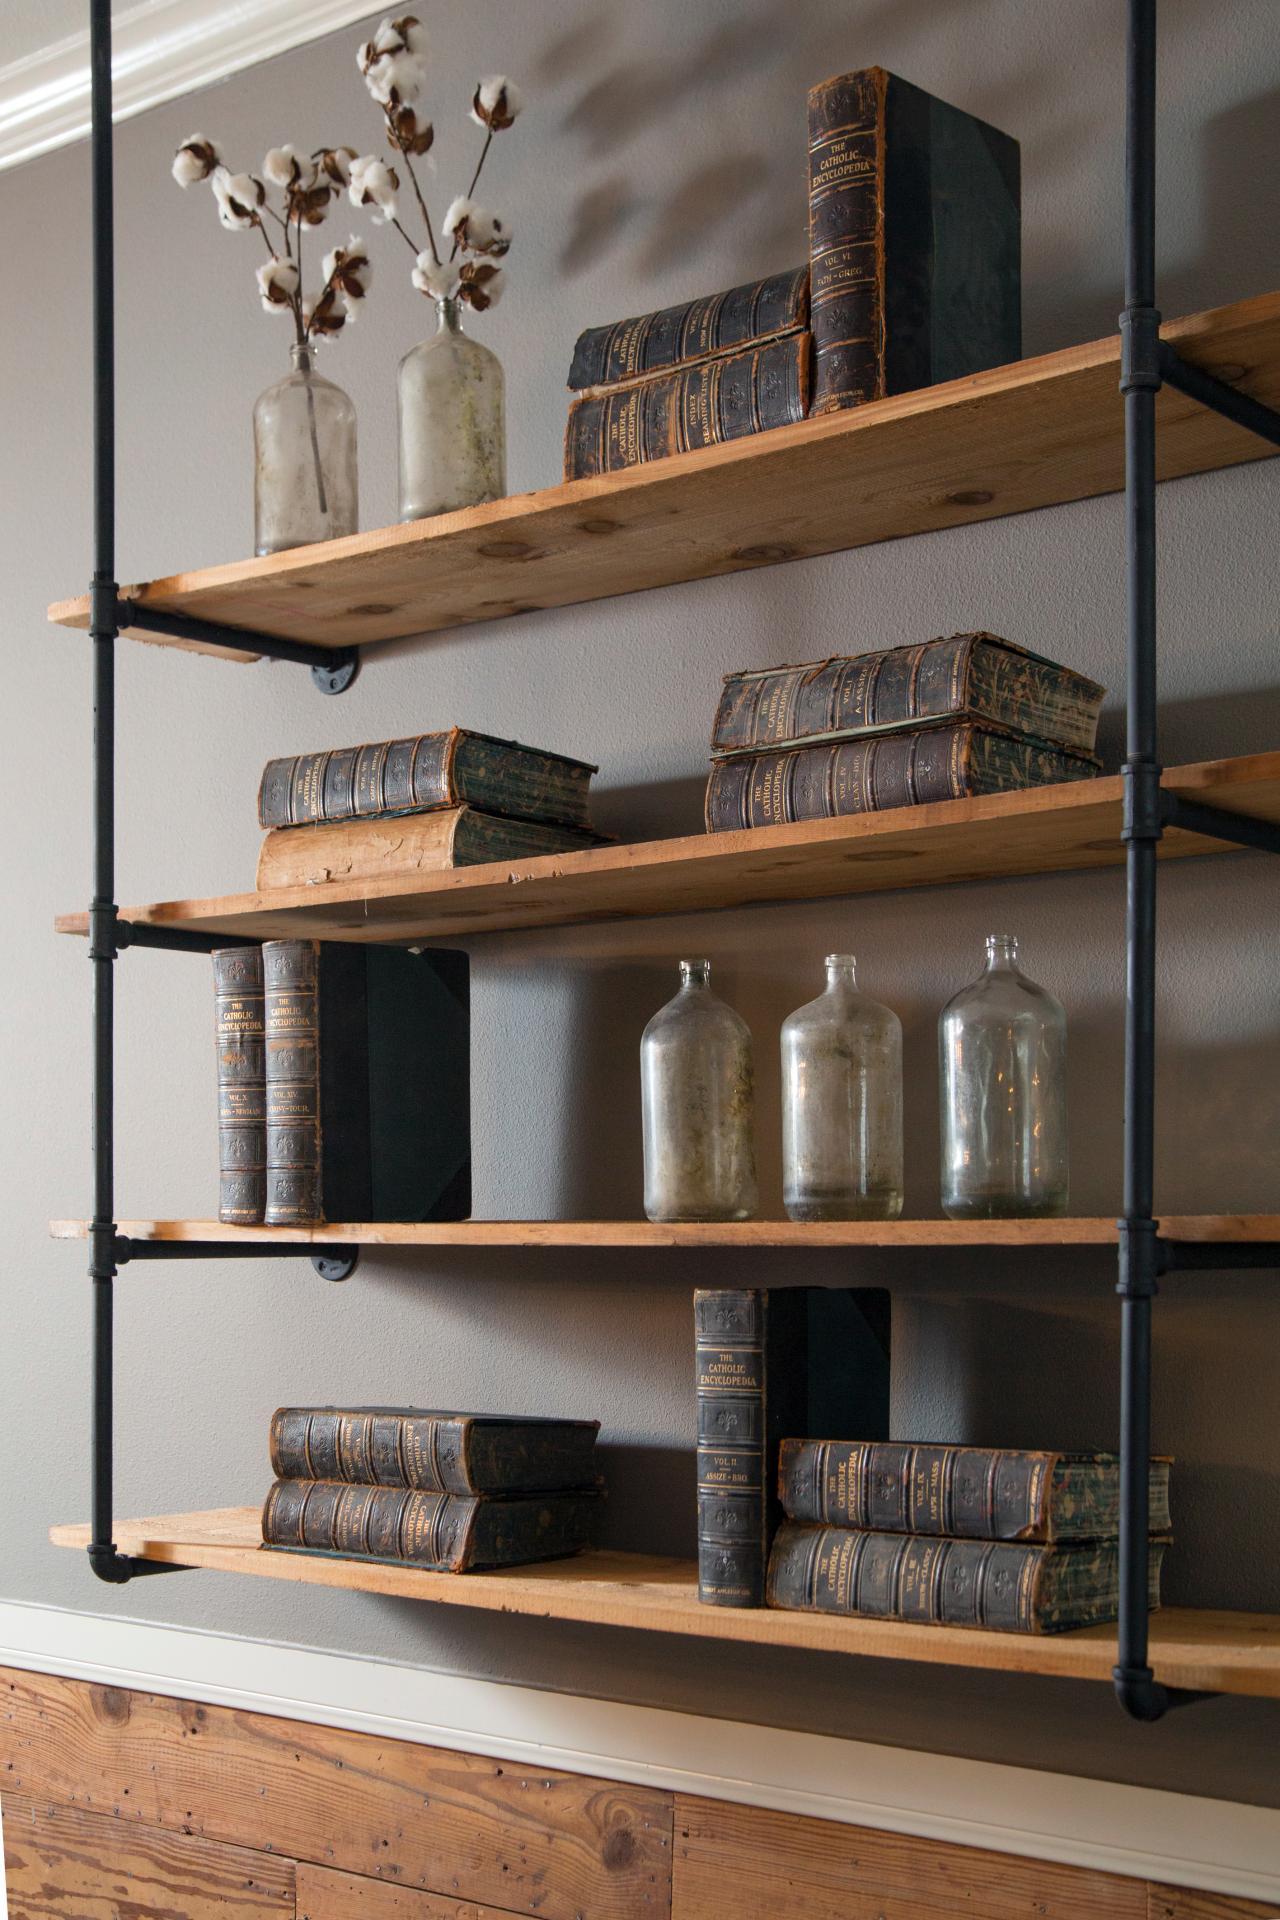 Drawn planks industrial Ideas like plumbing Craftsman elements